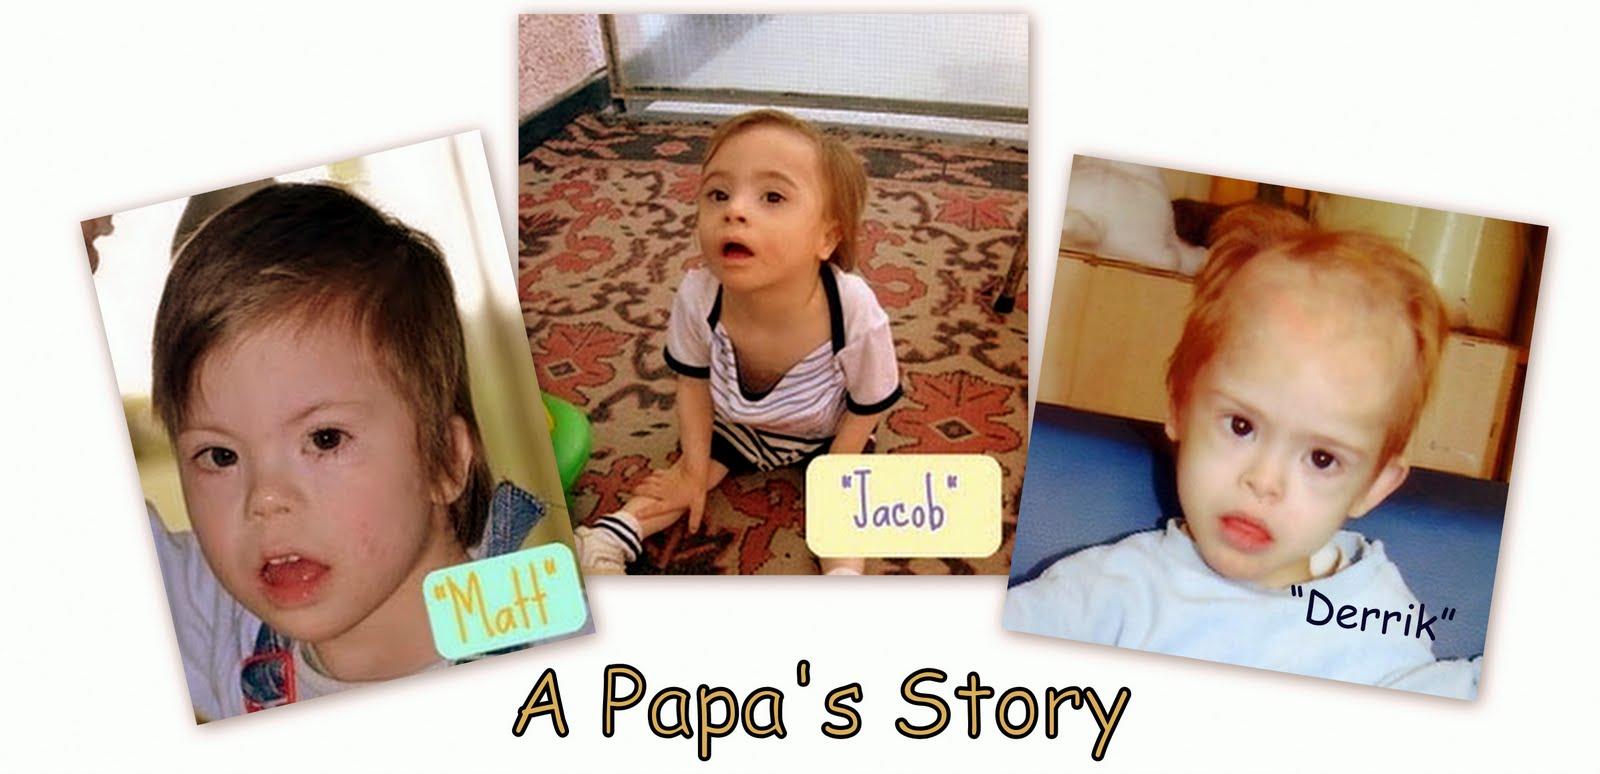 A Papa's Story